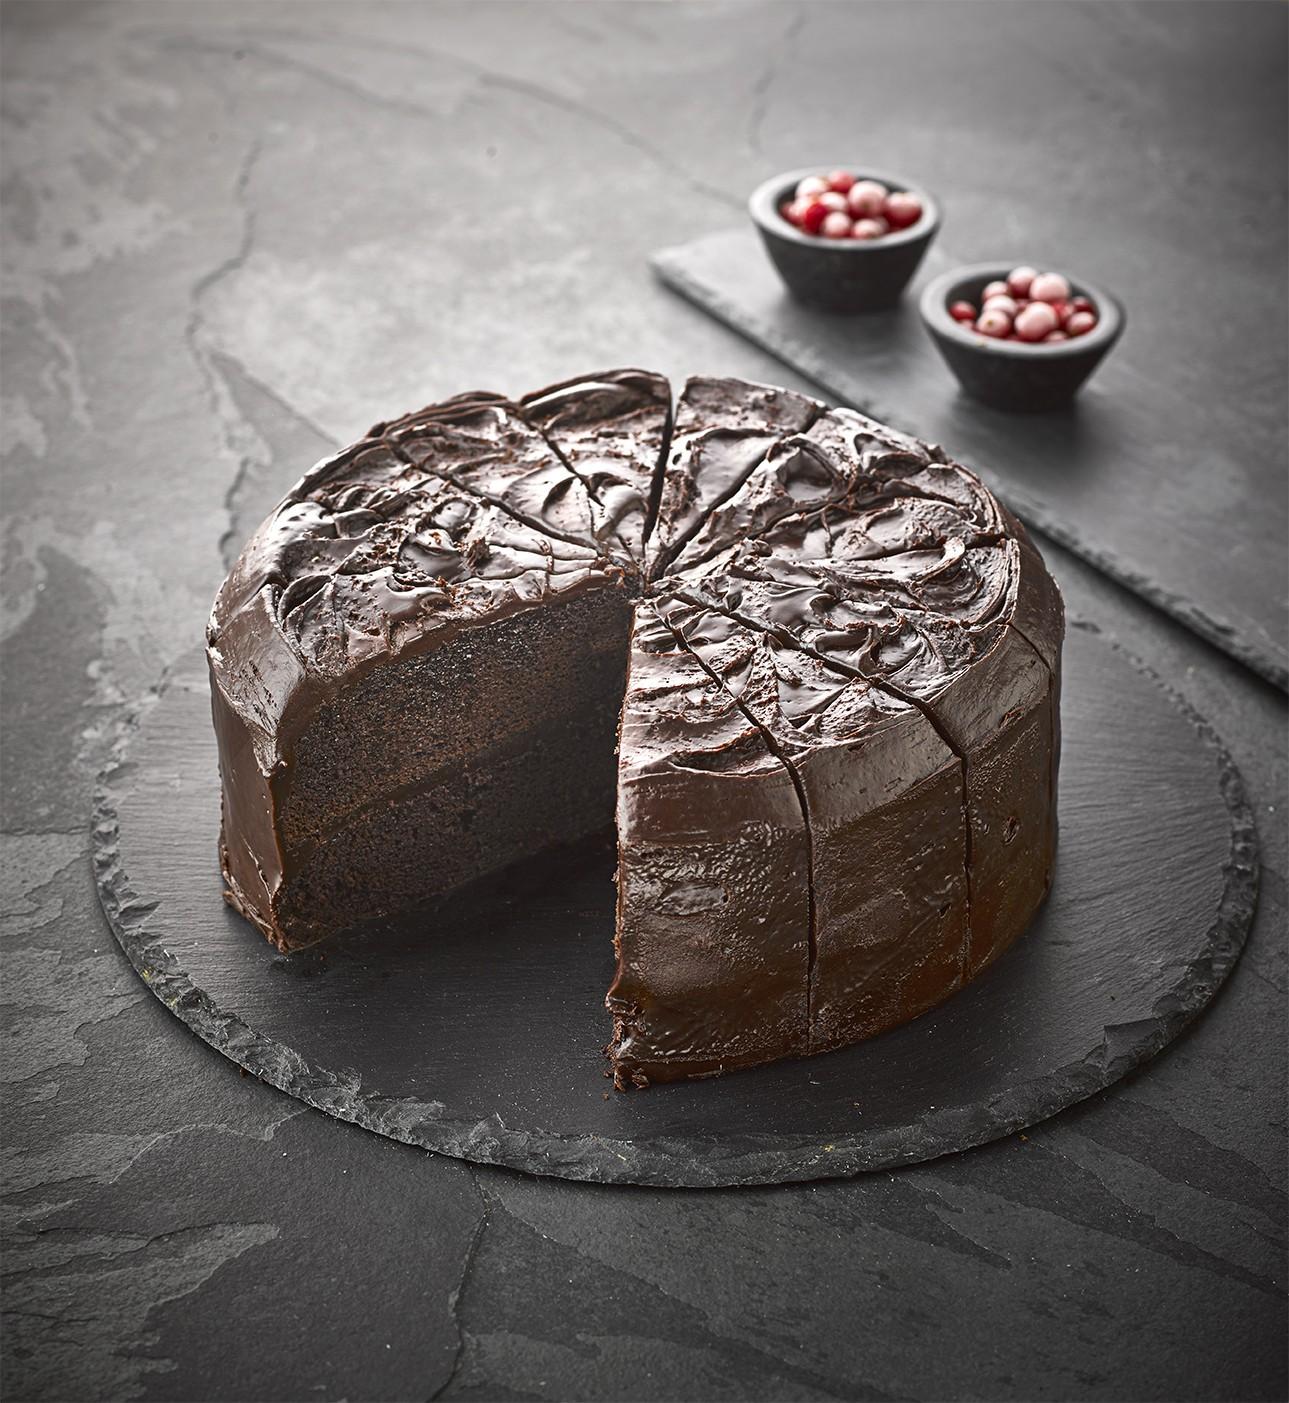 Sidoli Vegan Devils Food Chocolate Cake